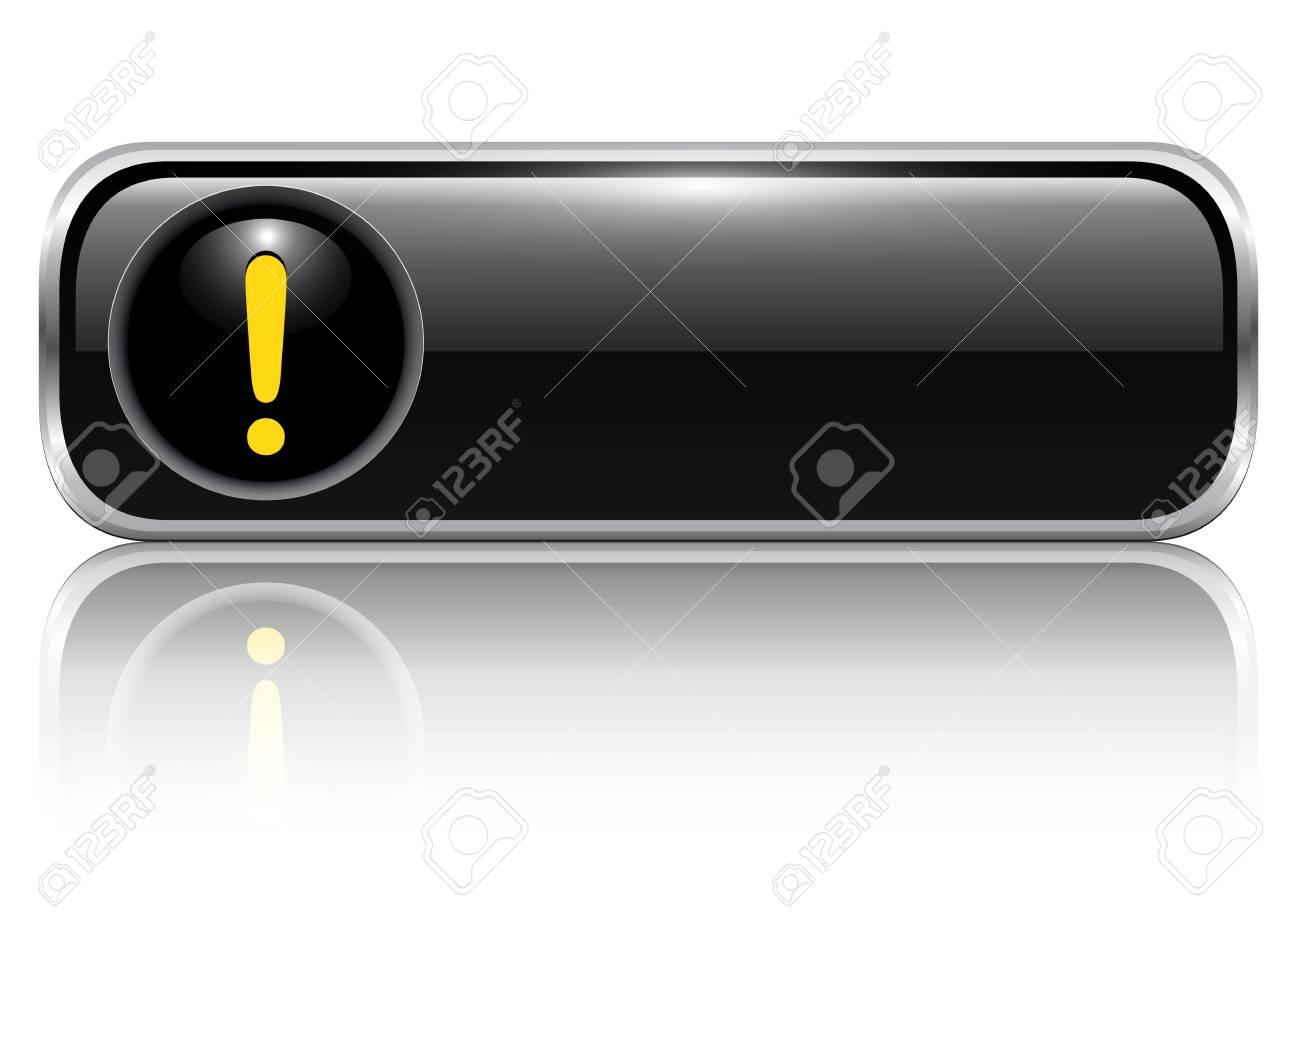 Exclamation danger button Stock Vector - 19104925